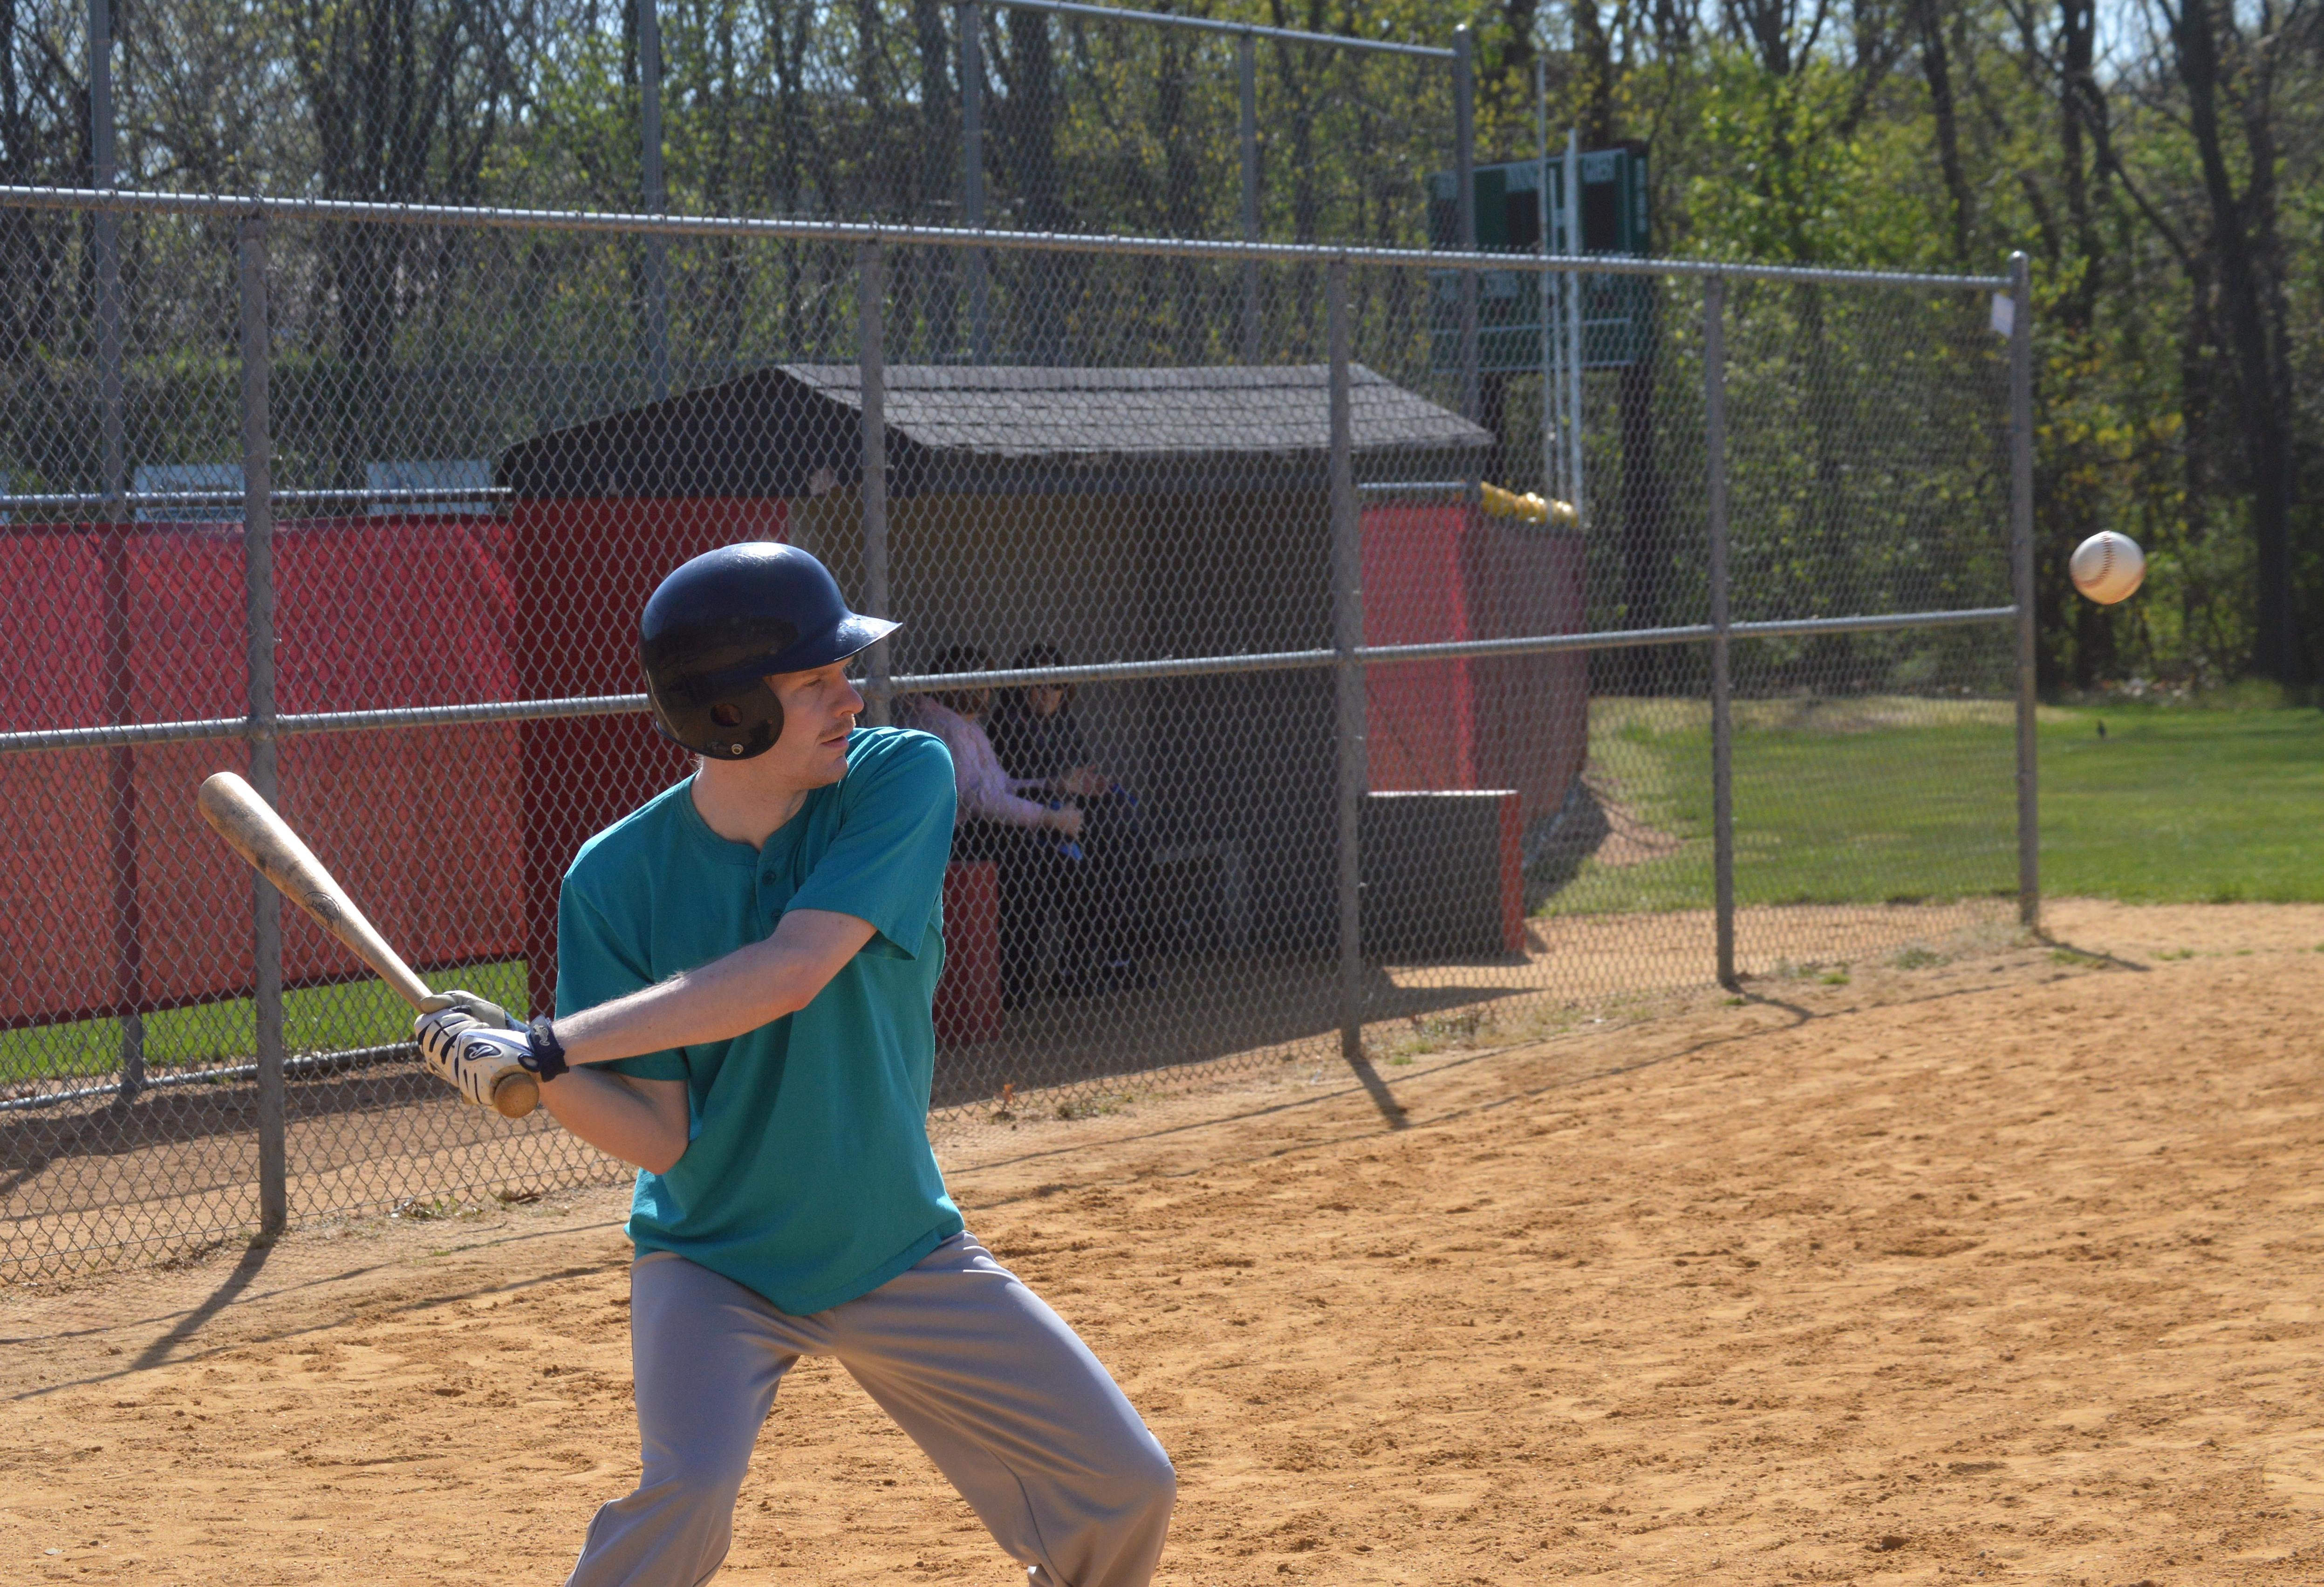 6b28cba3af6307bd0bbf_JV_-_Baseball_Buddies_4-24-16_-_Buddy_swing.JPG